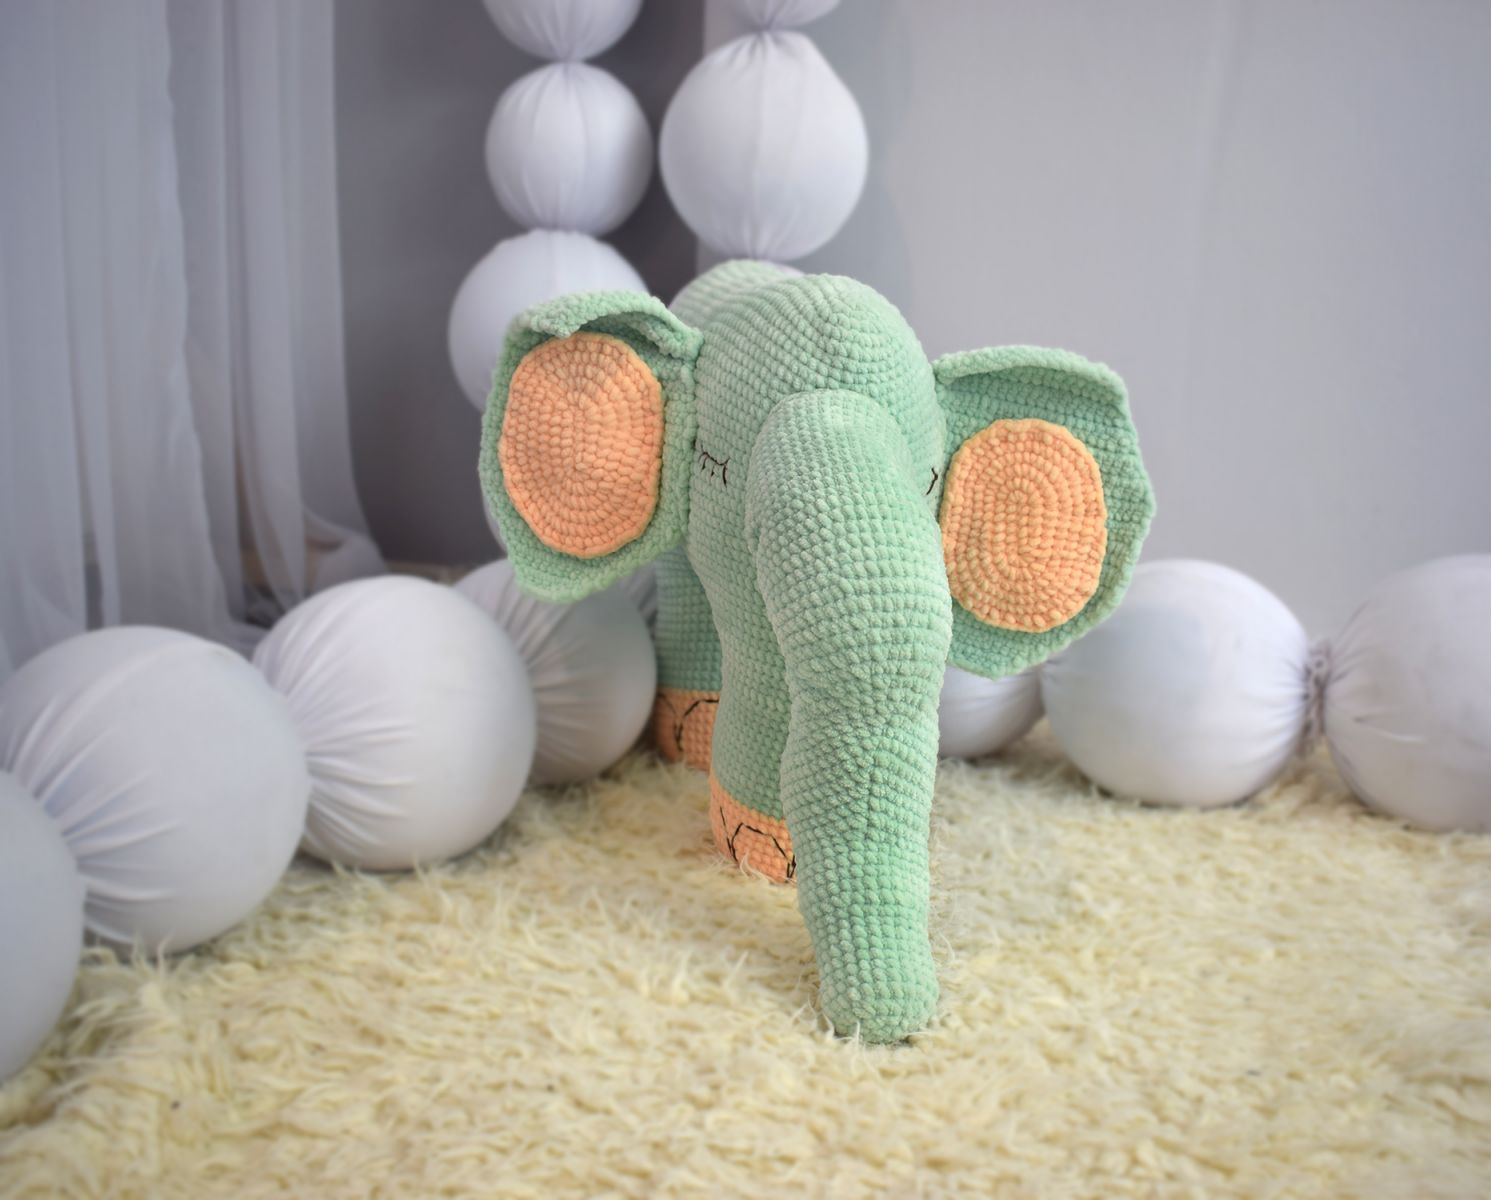 LARGE Elephant. Crochet. Knit. Amigurumi. Soft Toy. Stuffed ... | 1200x1491